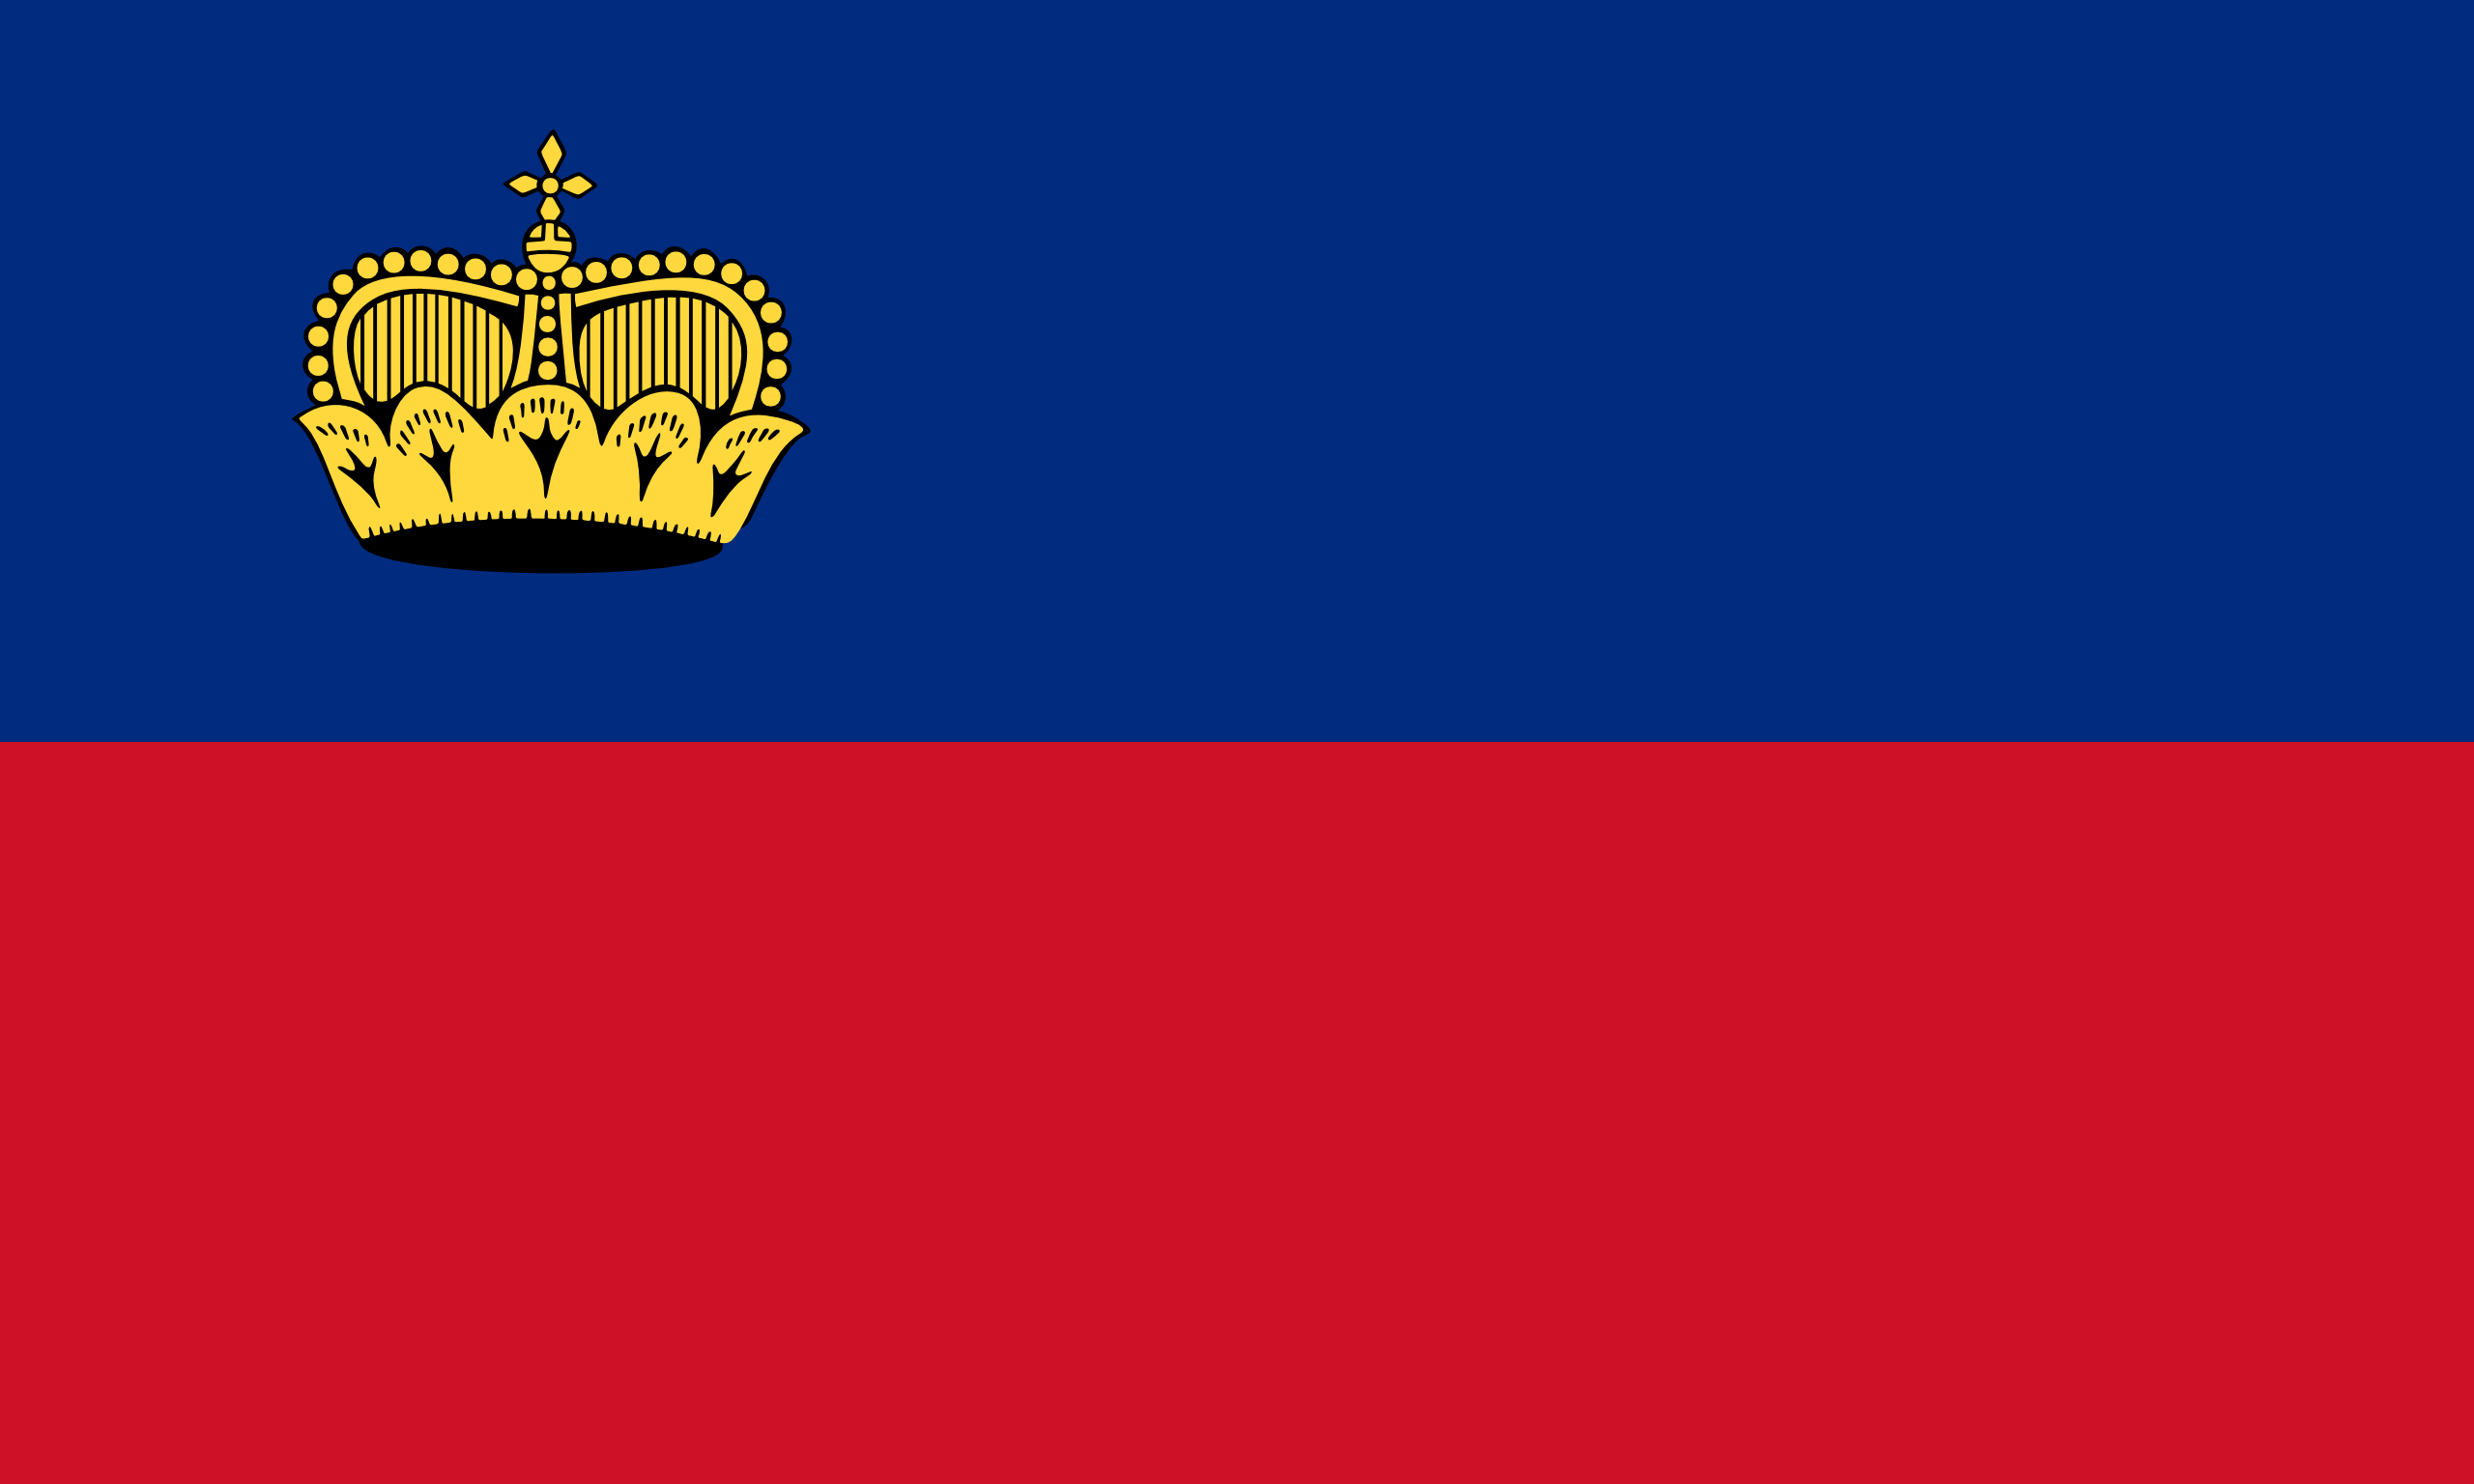 liechtenstein, देश, emblema, लोग�प्रतीकbolo - HD वॉलपेपर - प्रोफेसर-falken.com